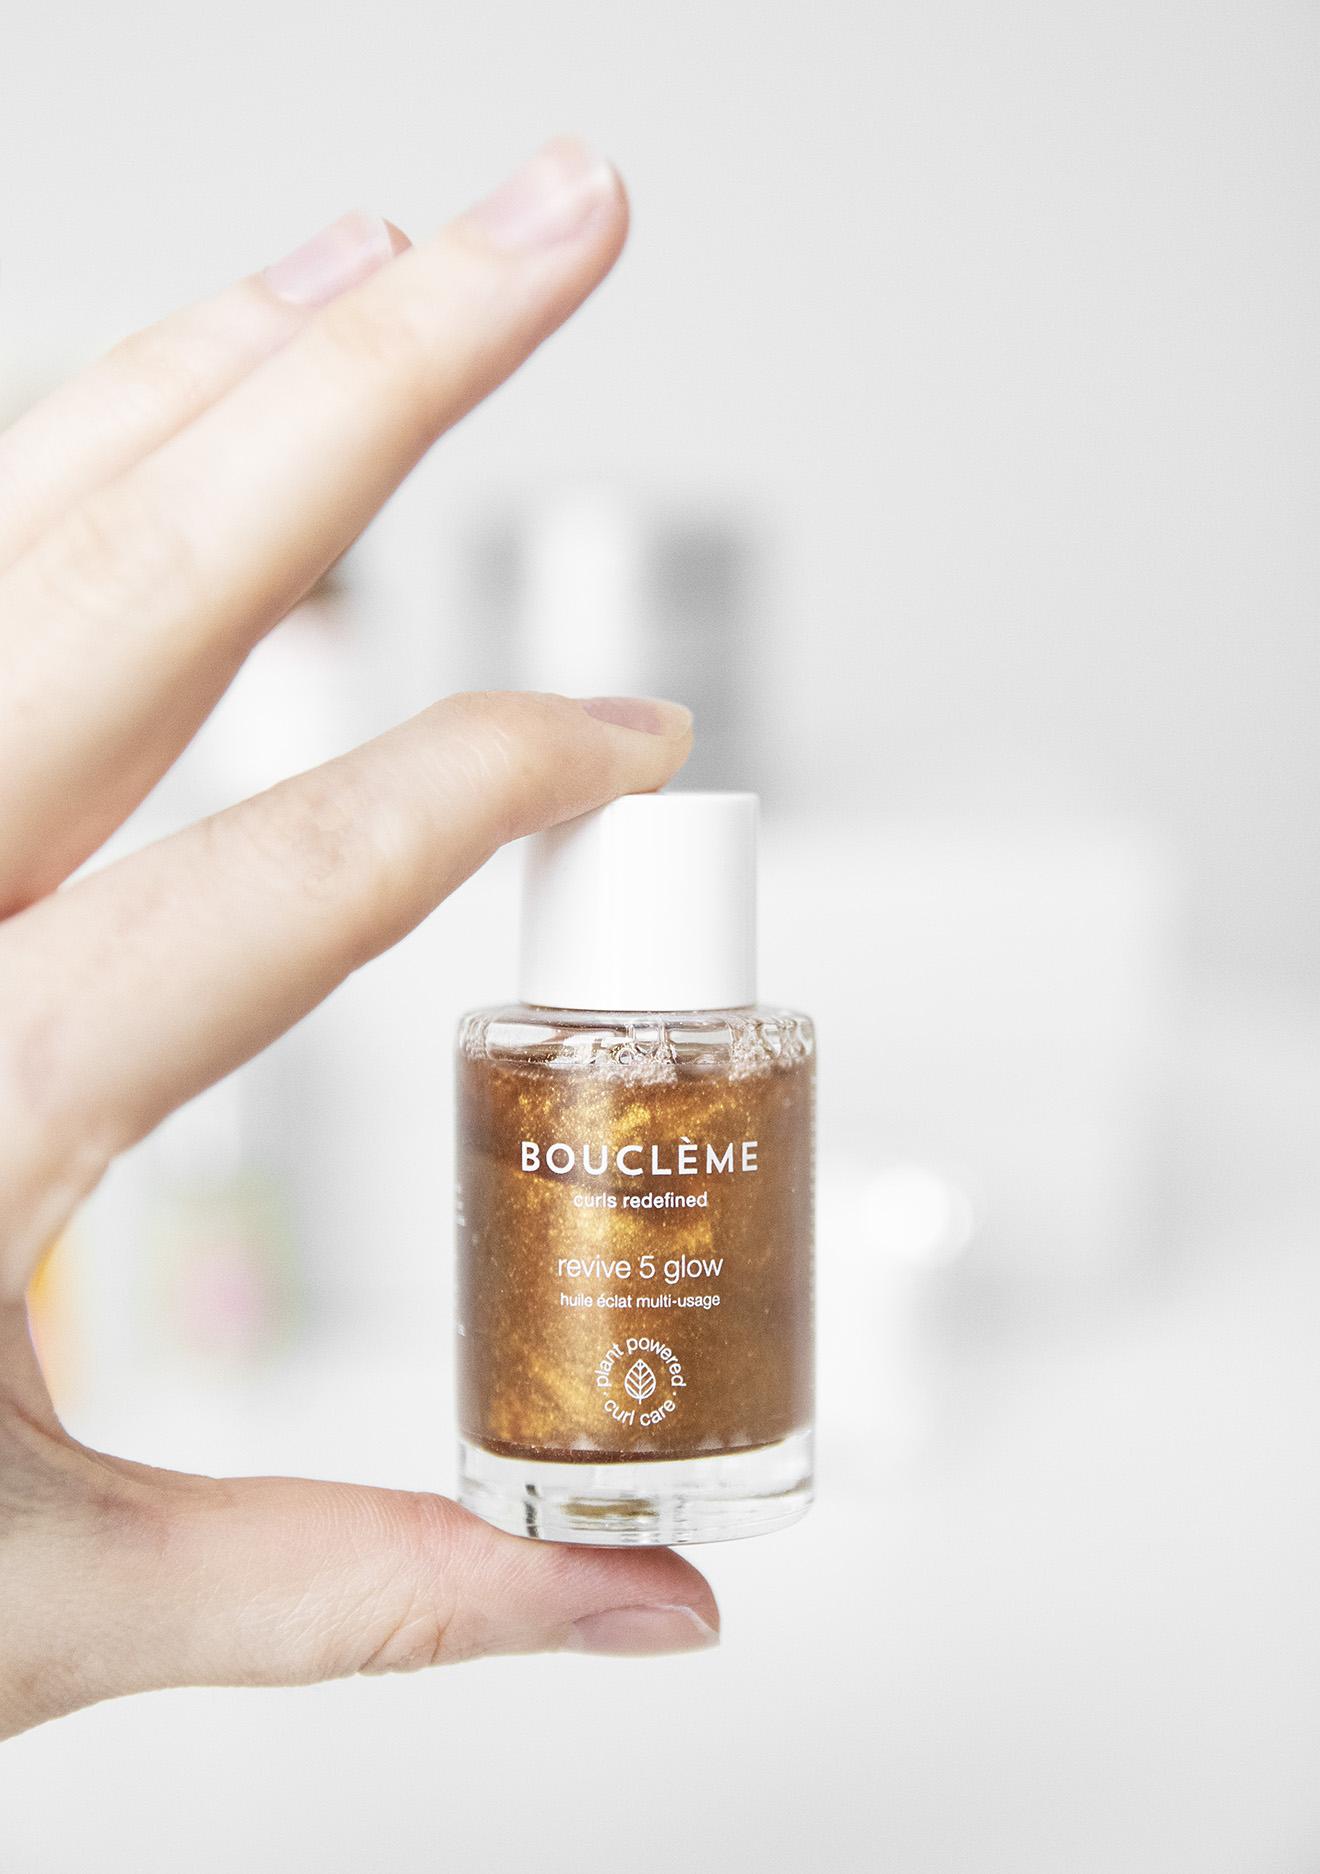 Boucleme Revive 5 Glow Multi Usage Oil